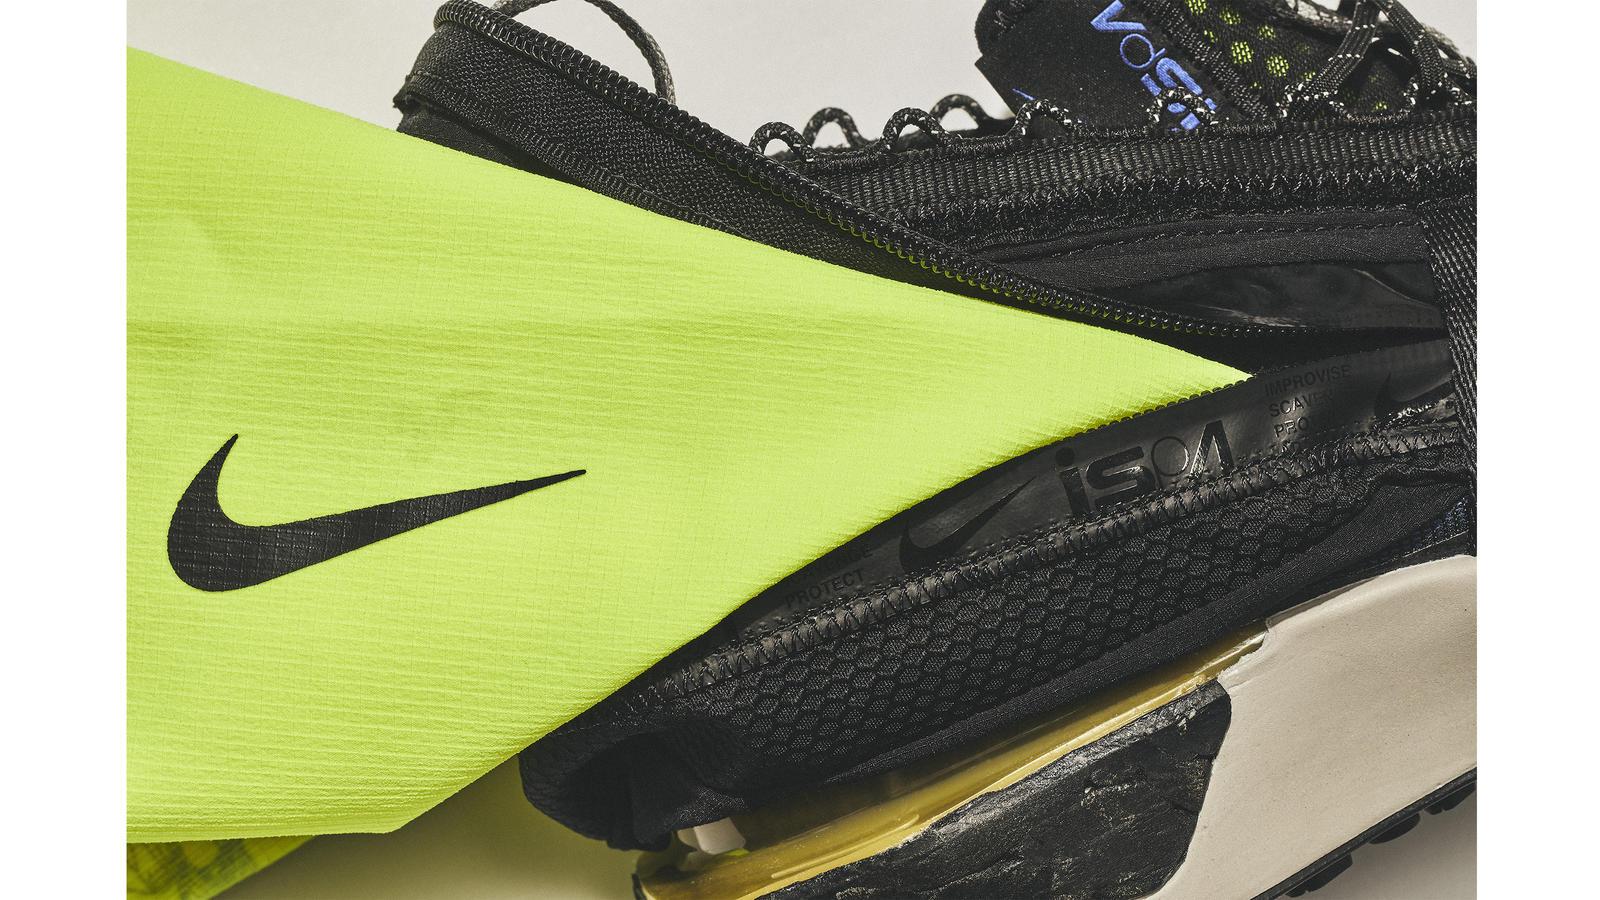 Nike ISPA Drifter Gator 14